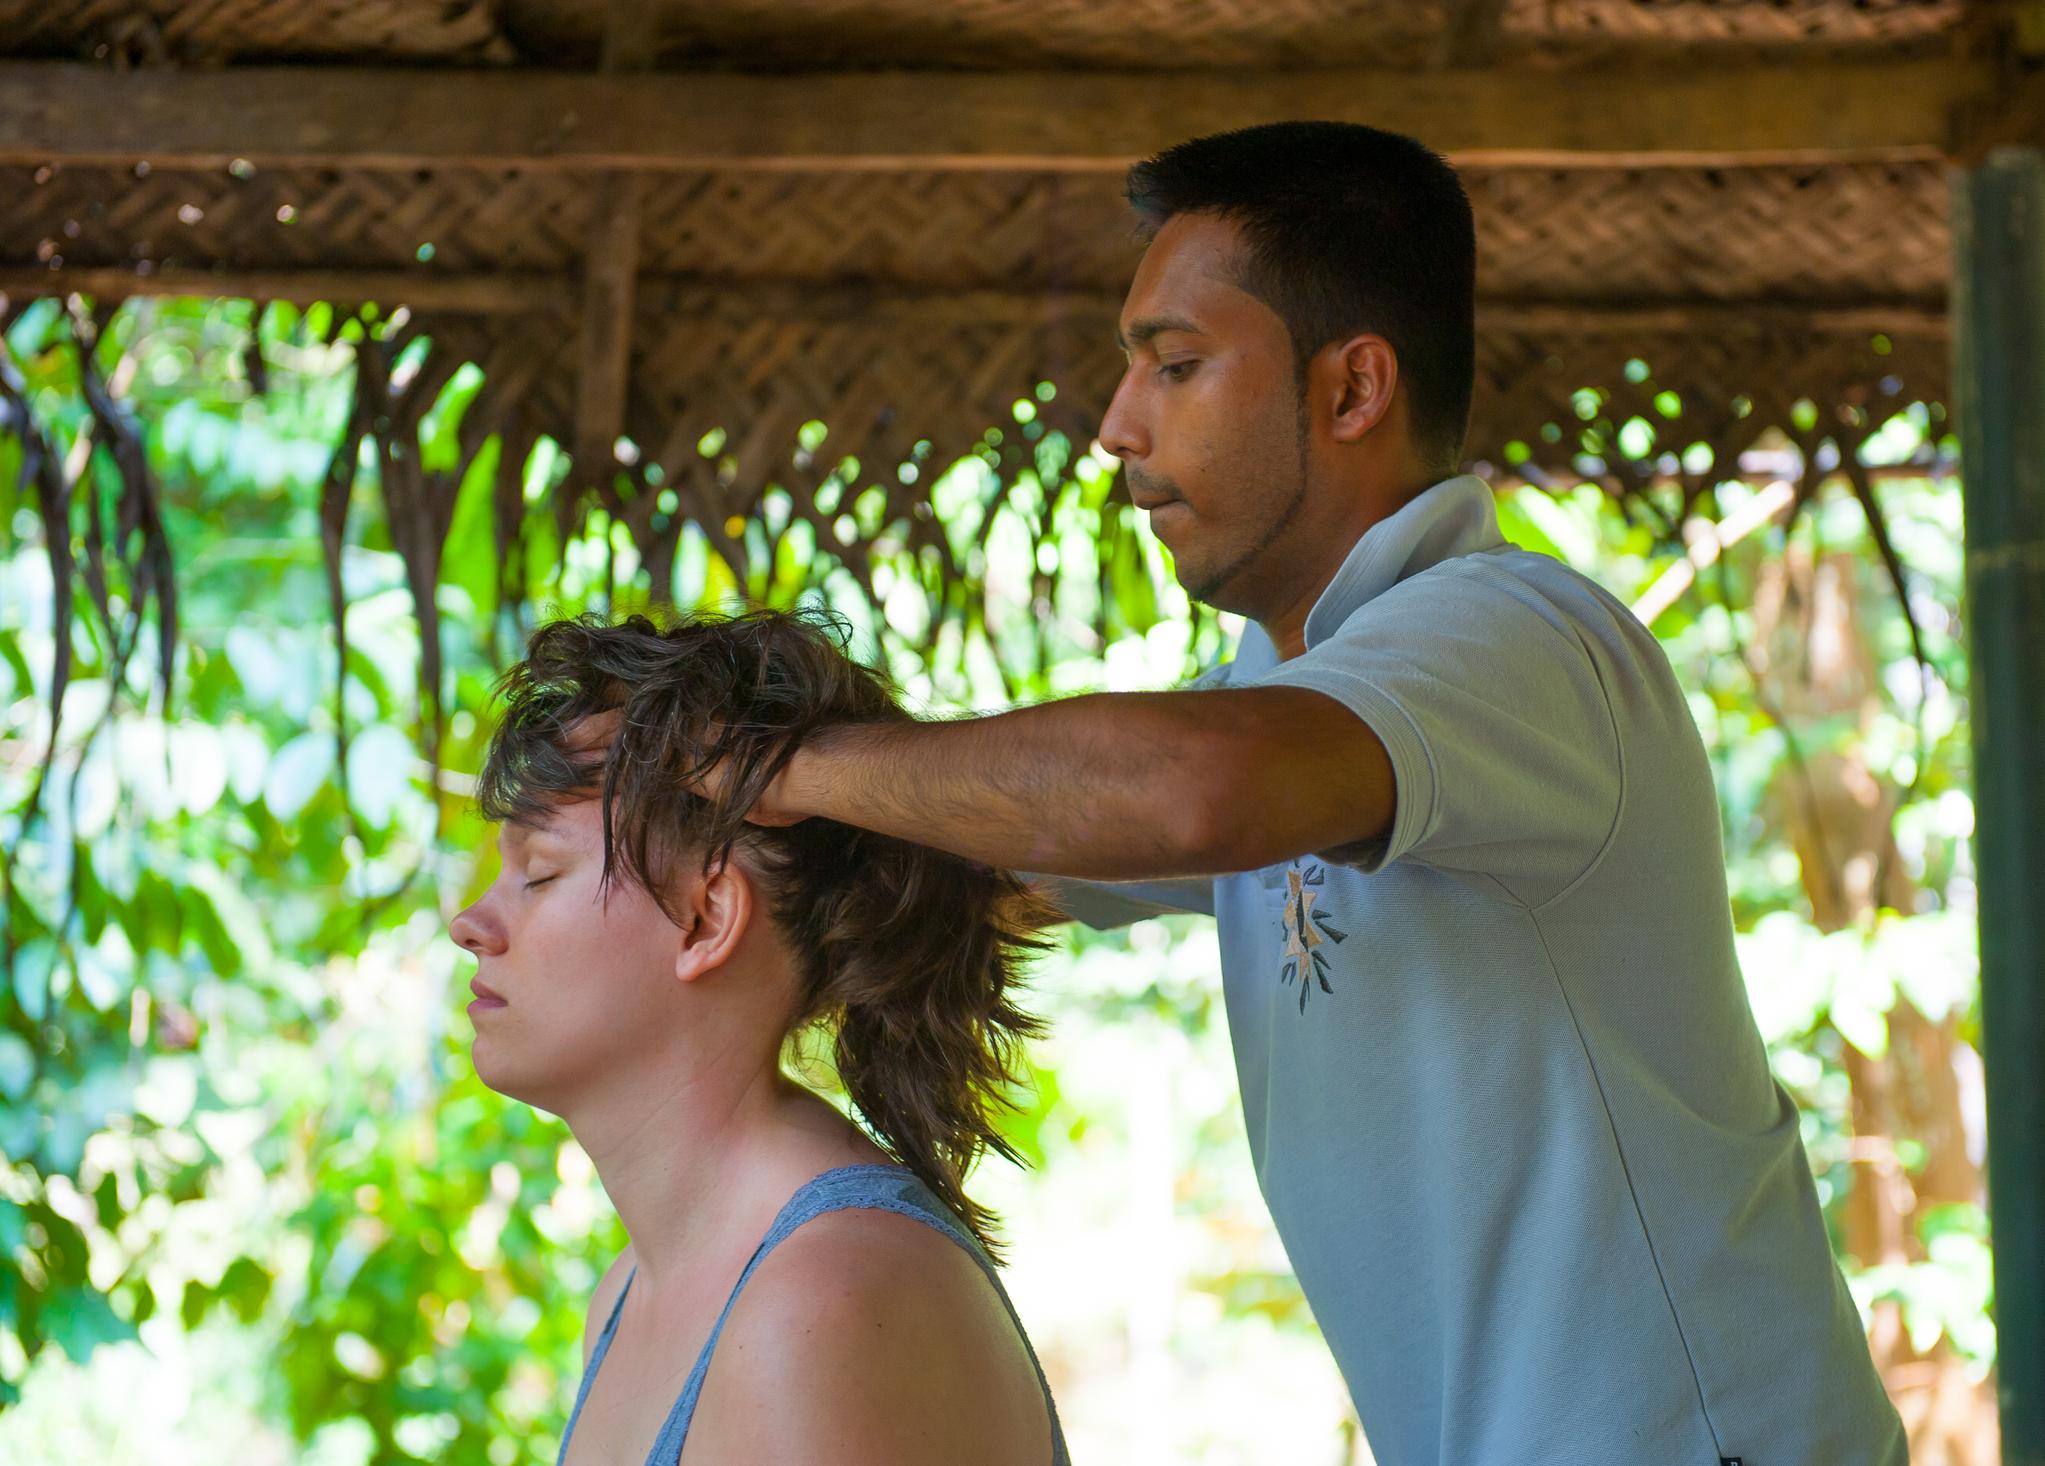 hoofdmassage, ayurvedisch, massage, massagecursus